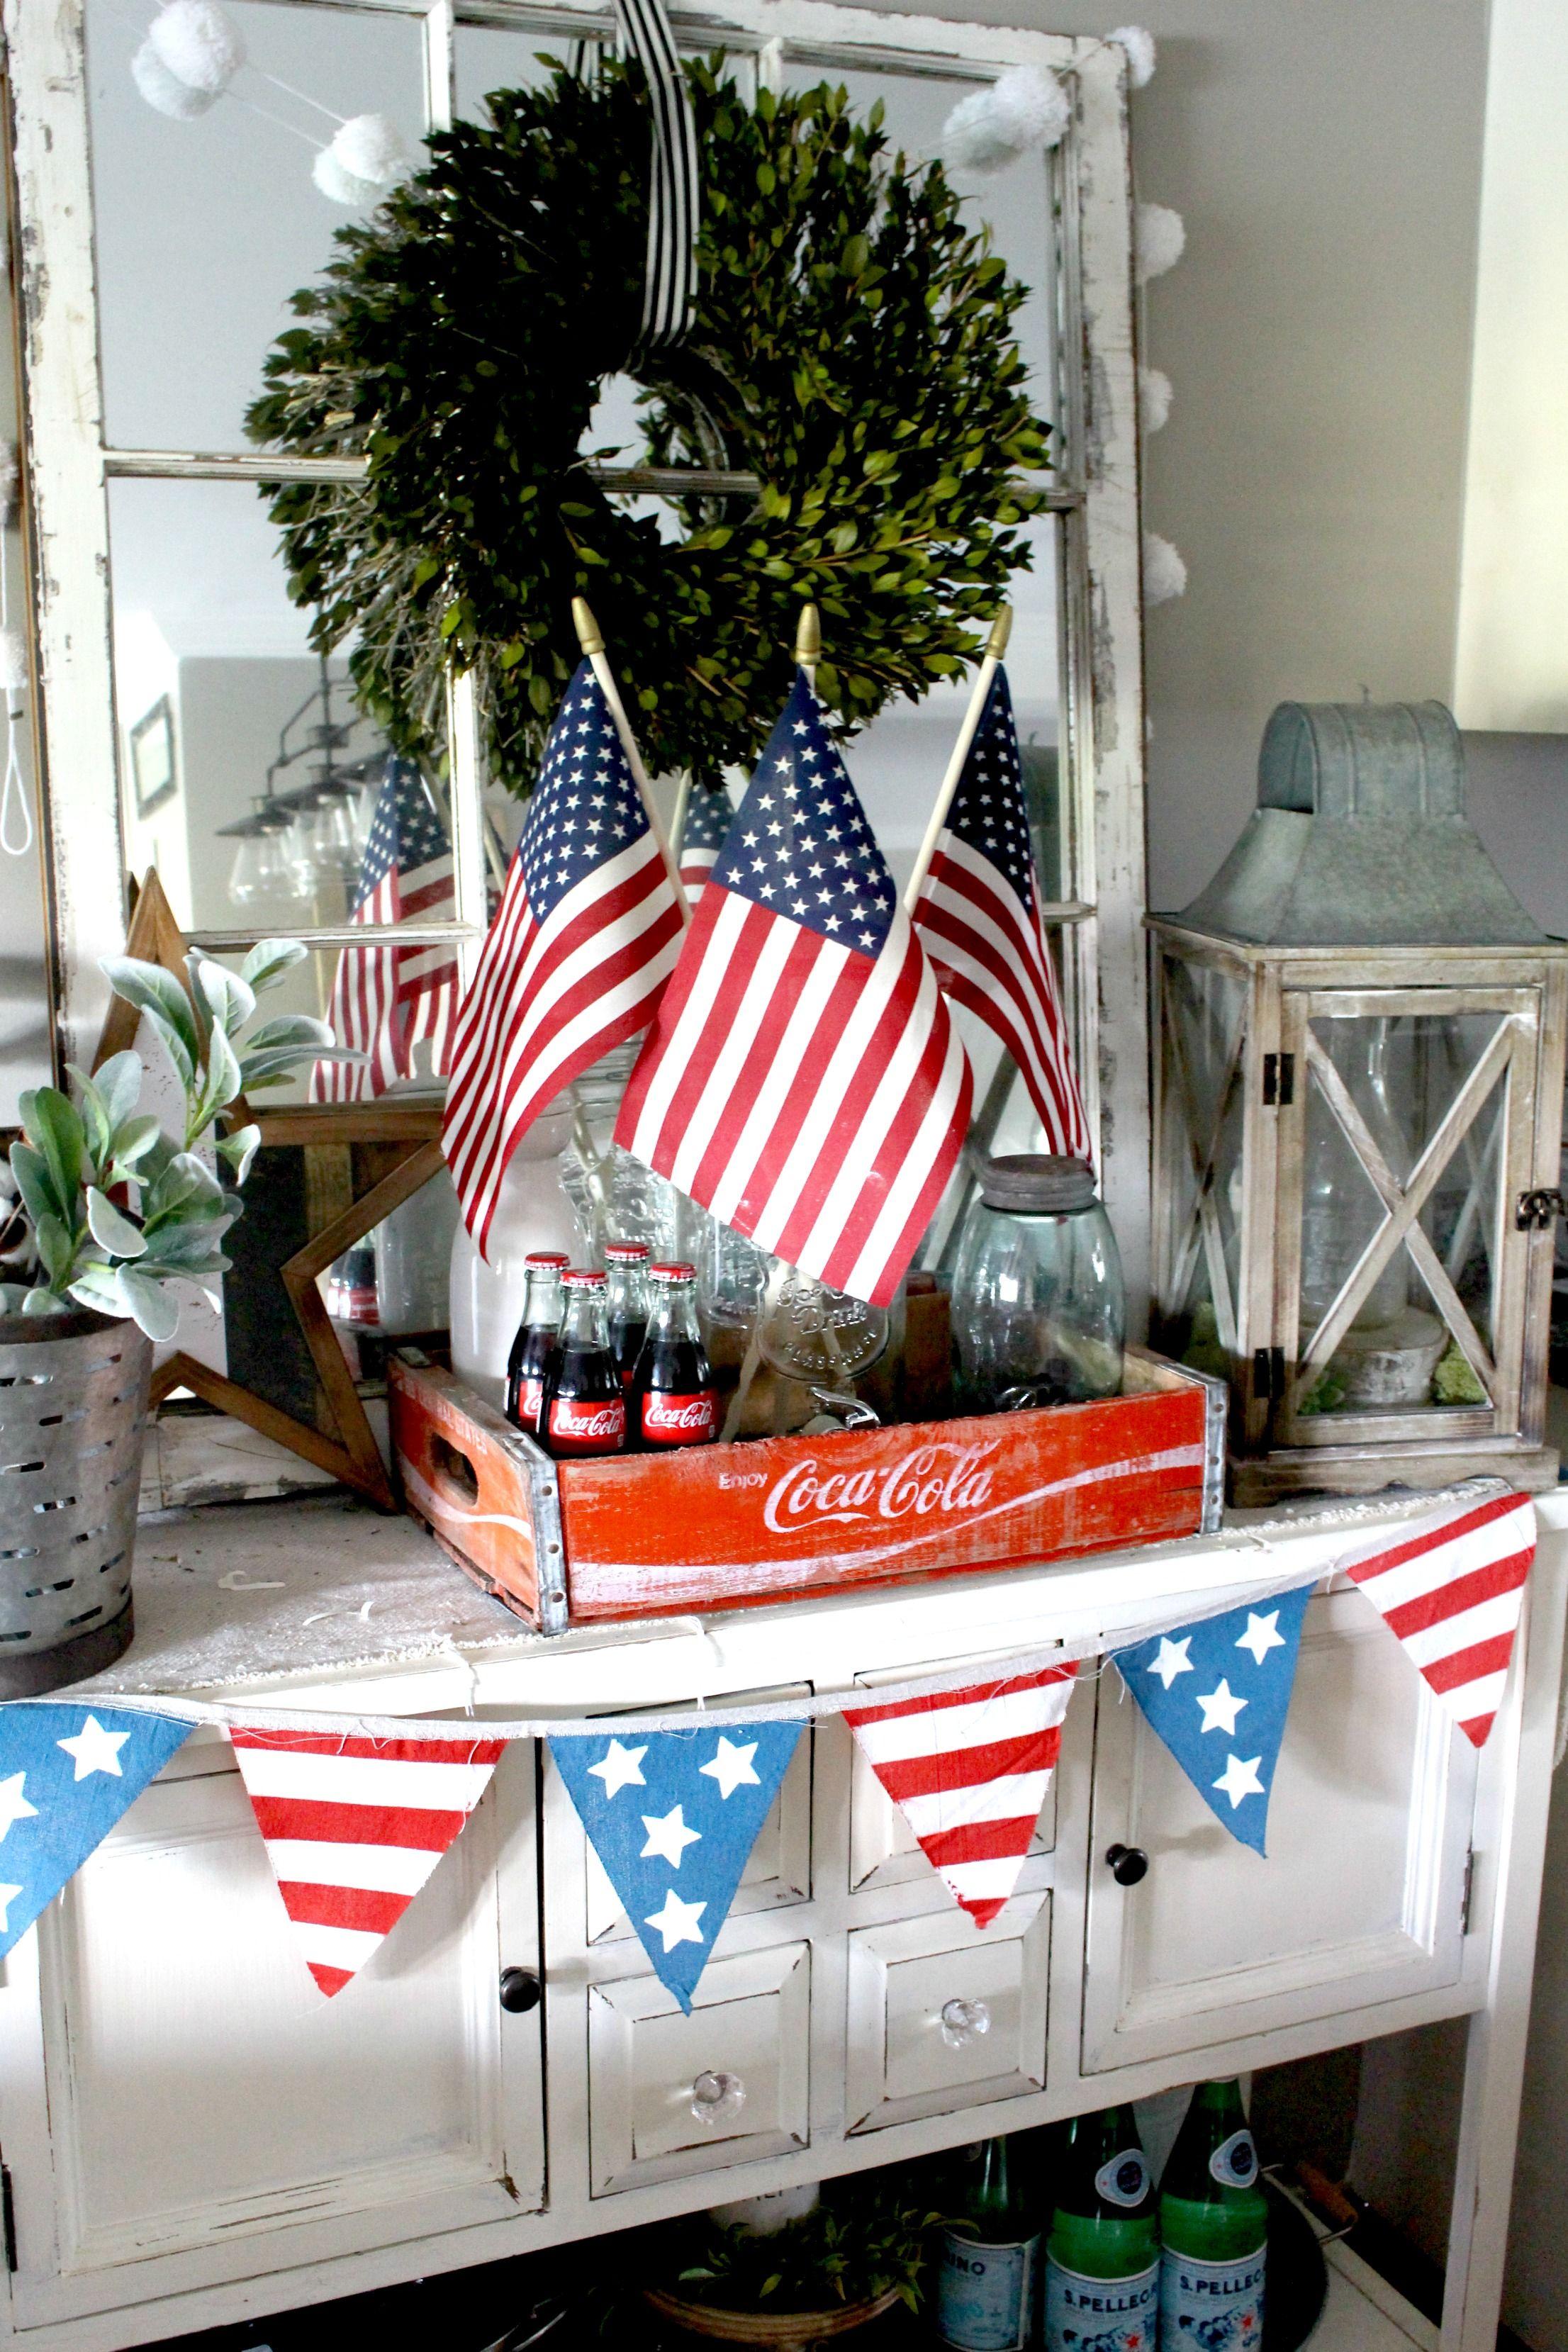 Rustic 12th of July Decor Americana Farmhouse @theglamfarmhouse